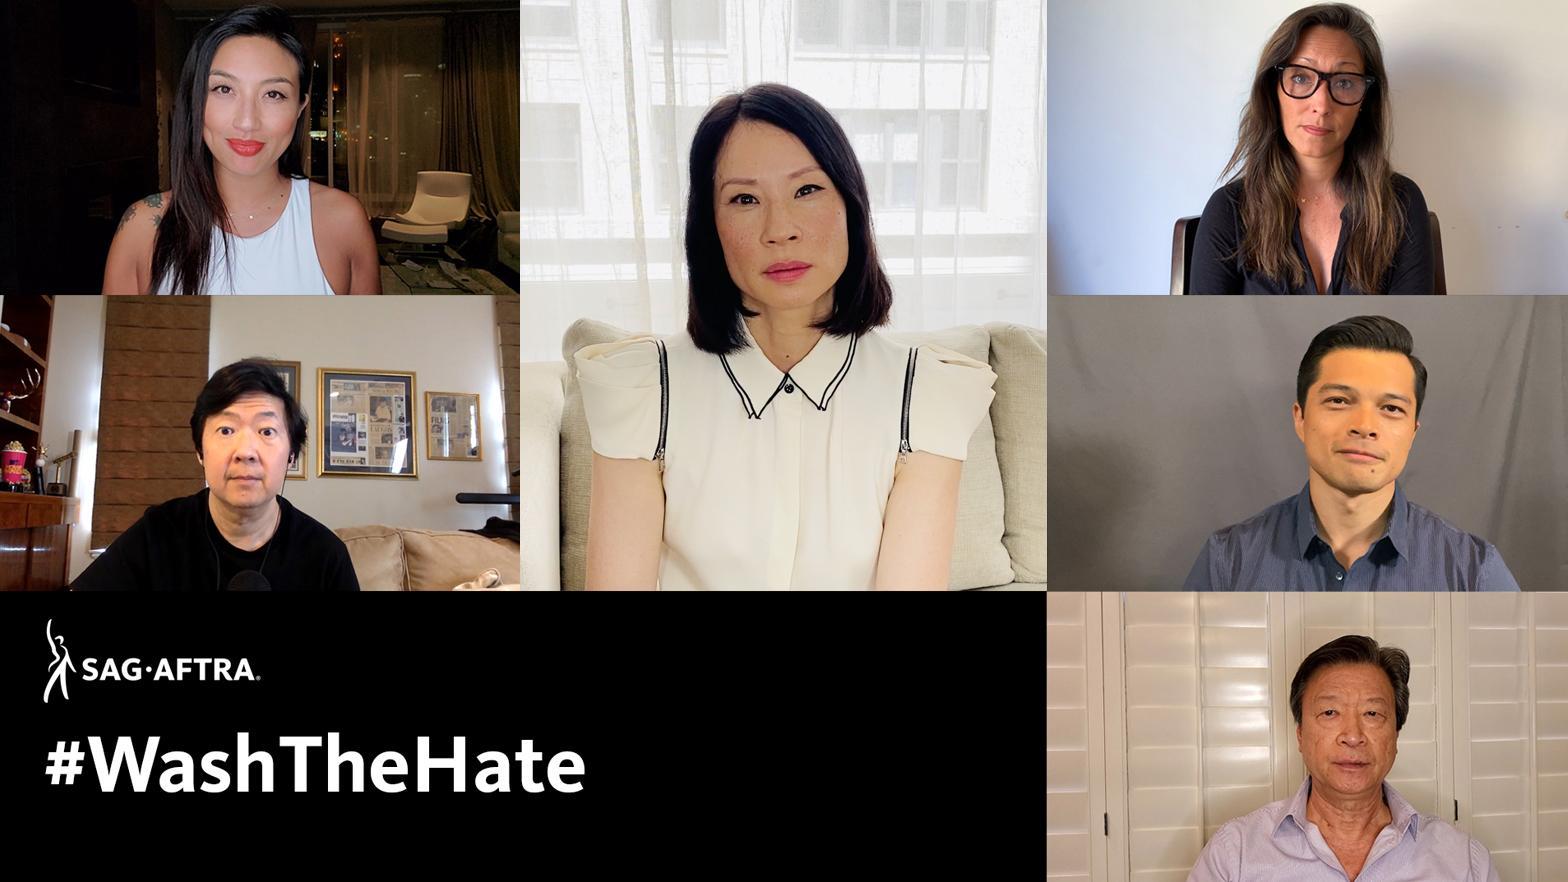 Fotogramas del video, Jeannie Mai, Ken Jeong, Lucy Liu, Christina Chang, Vincent Rodriguez III, Tzi Ma con #WashTheHate